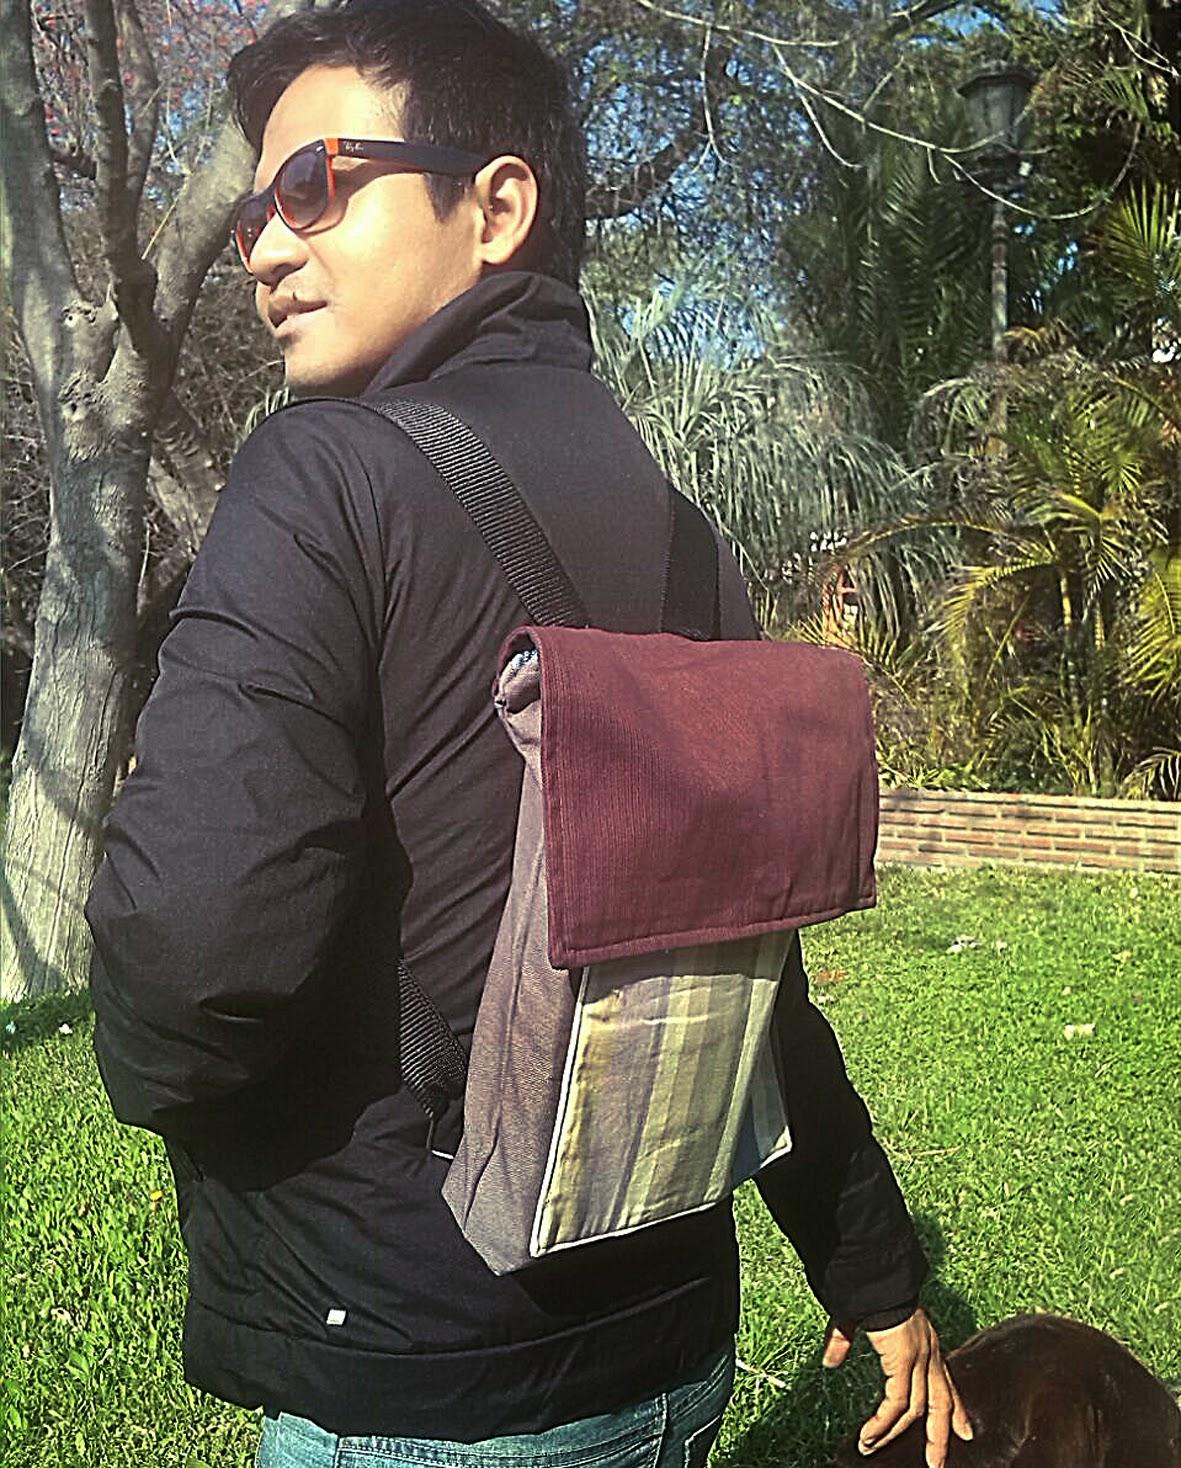 mochila, chico, moda eco, moda ecologica, moda reciclada, bolsos